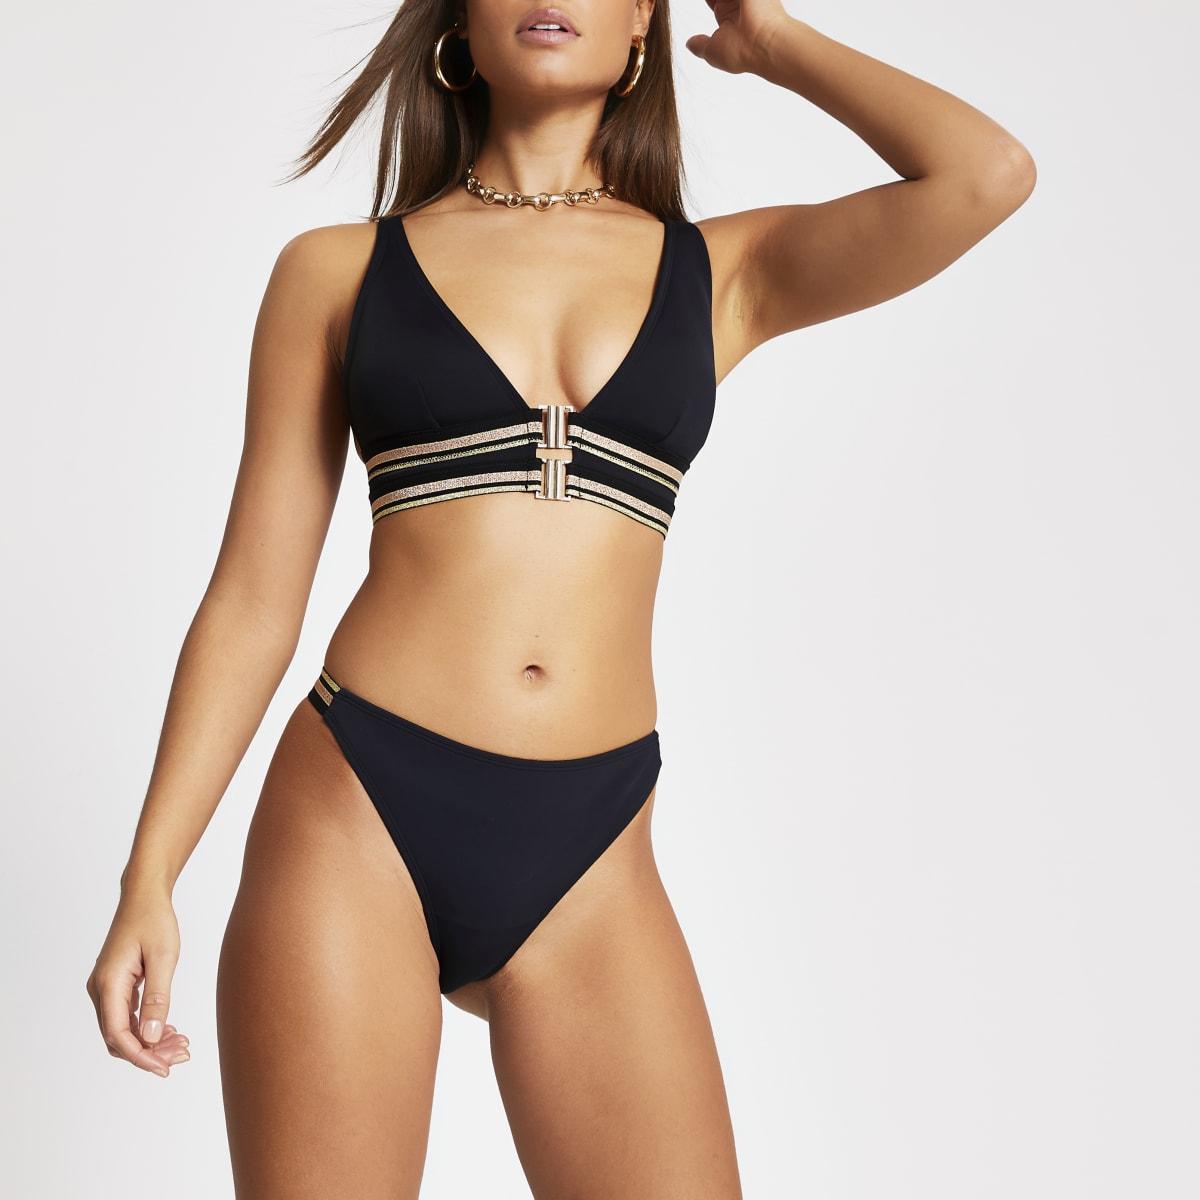 Bas de bikini échancrénoir avec bande métallisée